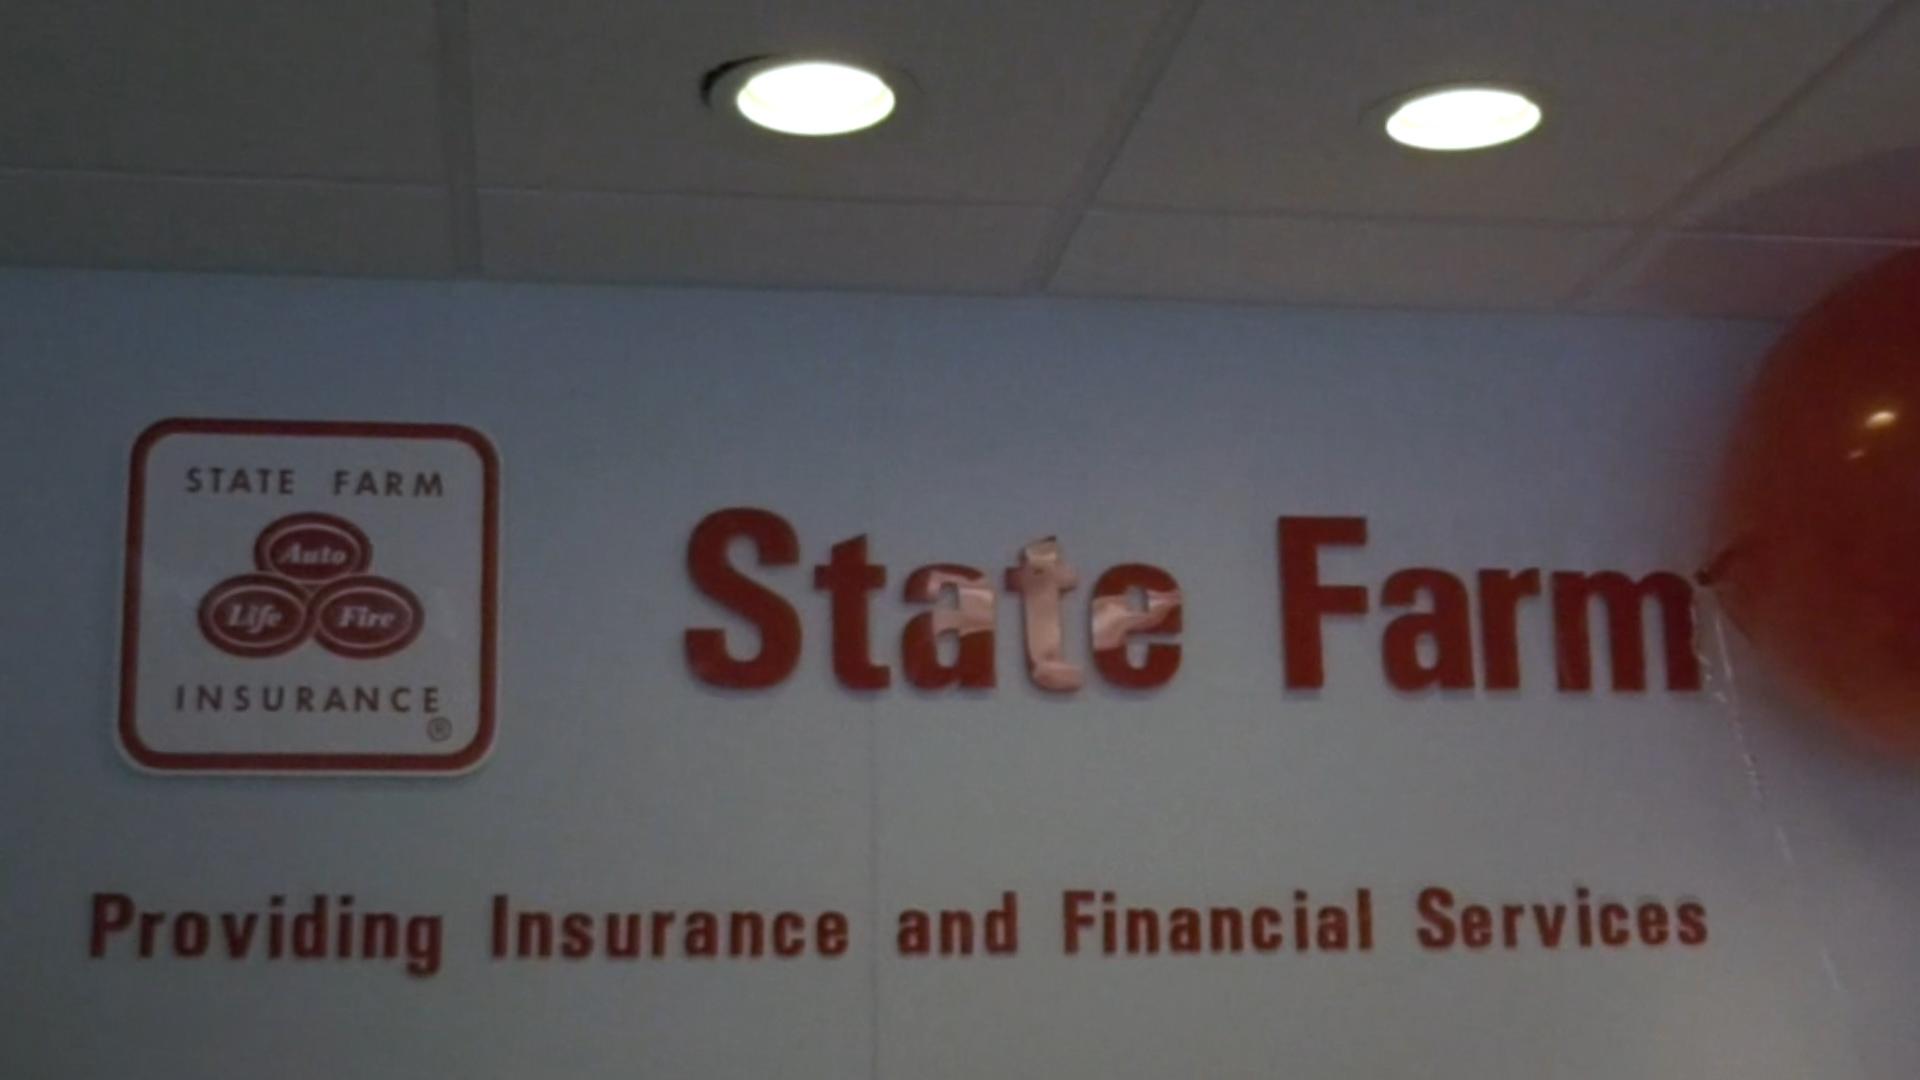 West Virginia Ranked No 1 In Likelihood Of Having An Insurance Claim Involving Animal Collision Woay Tv